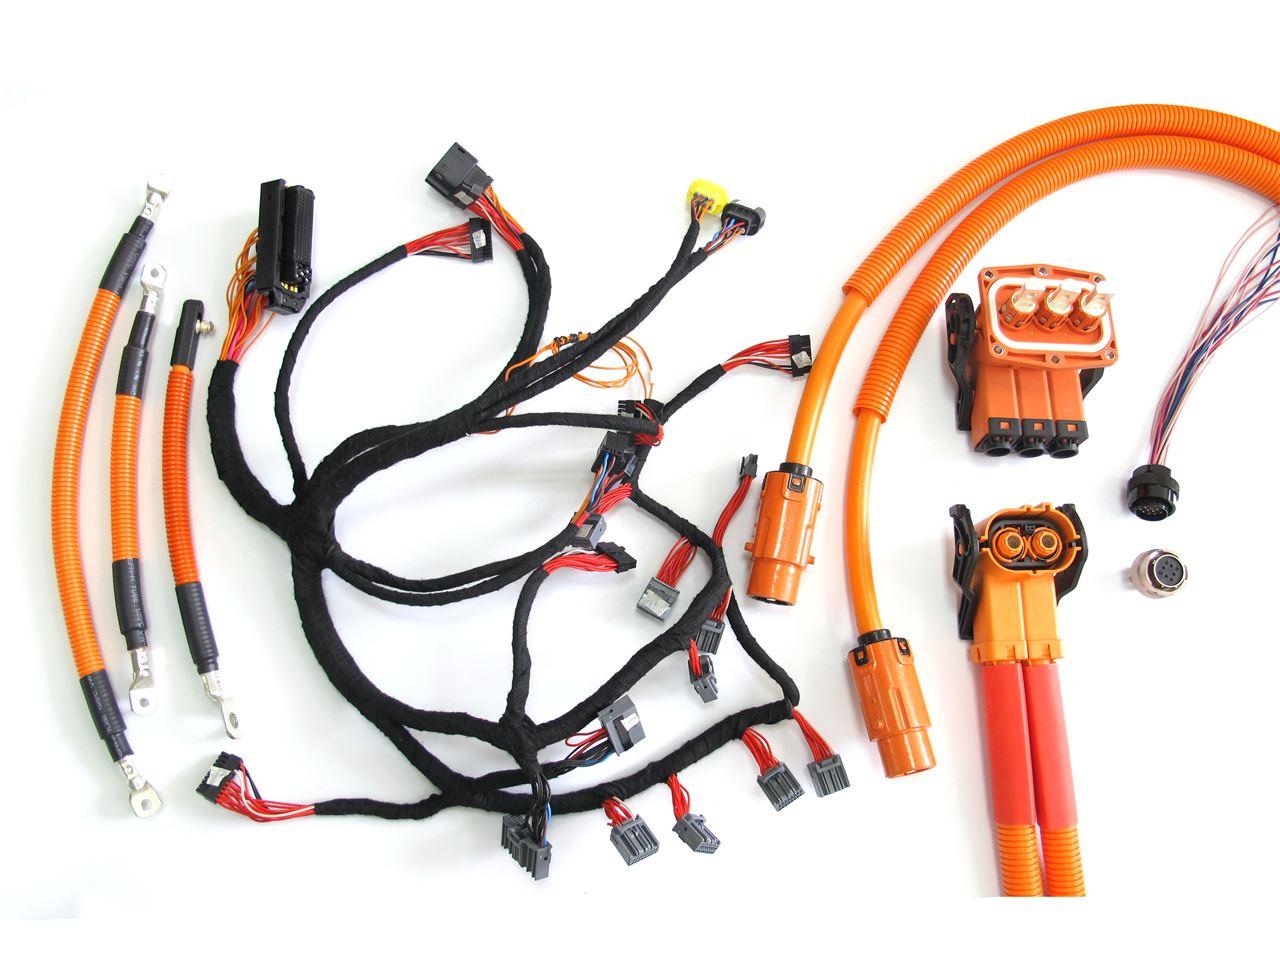 PDU高压箱,PDU高压箱,BMS线束,OBC线束,动力线束,高压动力线束,PACK线束,电动汽车线束,新能源汽车线束,电池箱采集线束,动力电池线束,控制器线束,电机动力线束